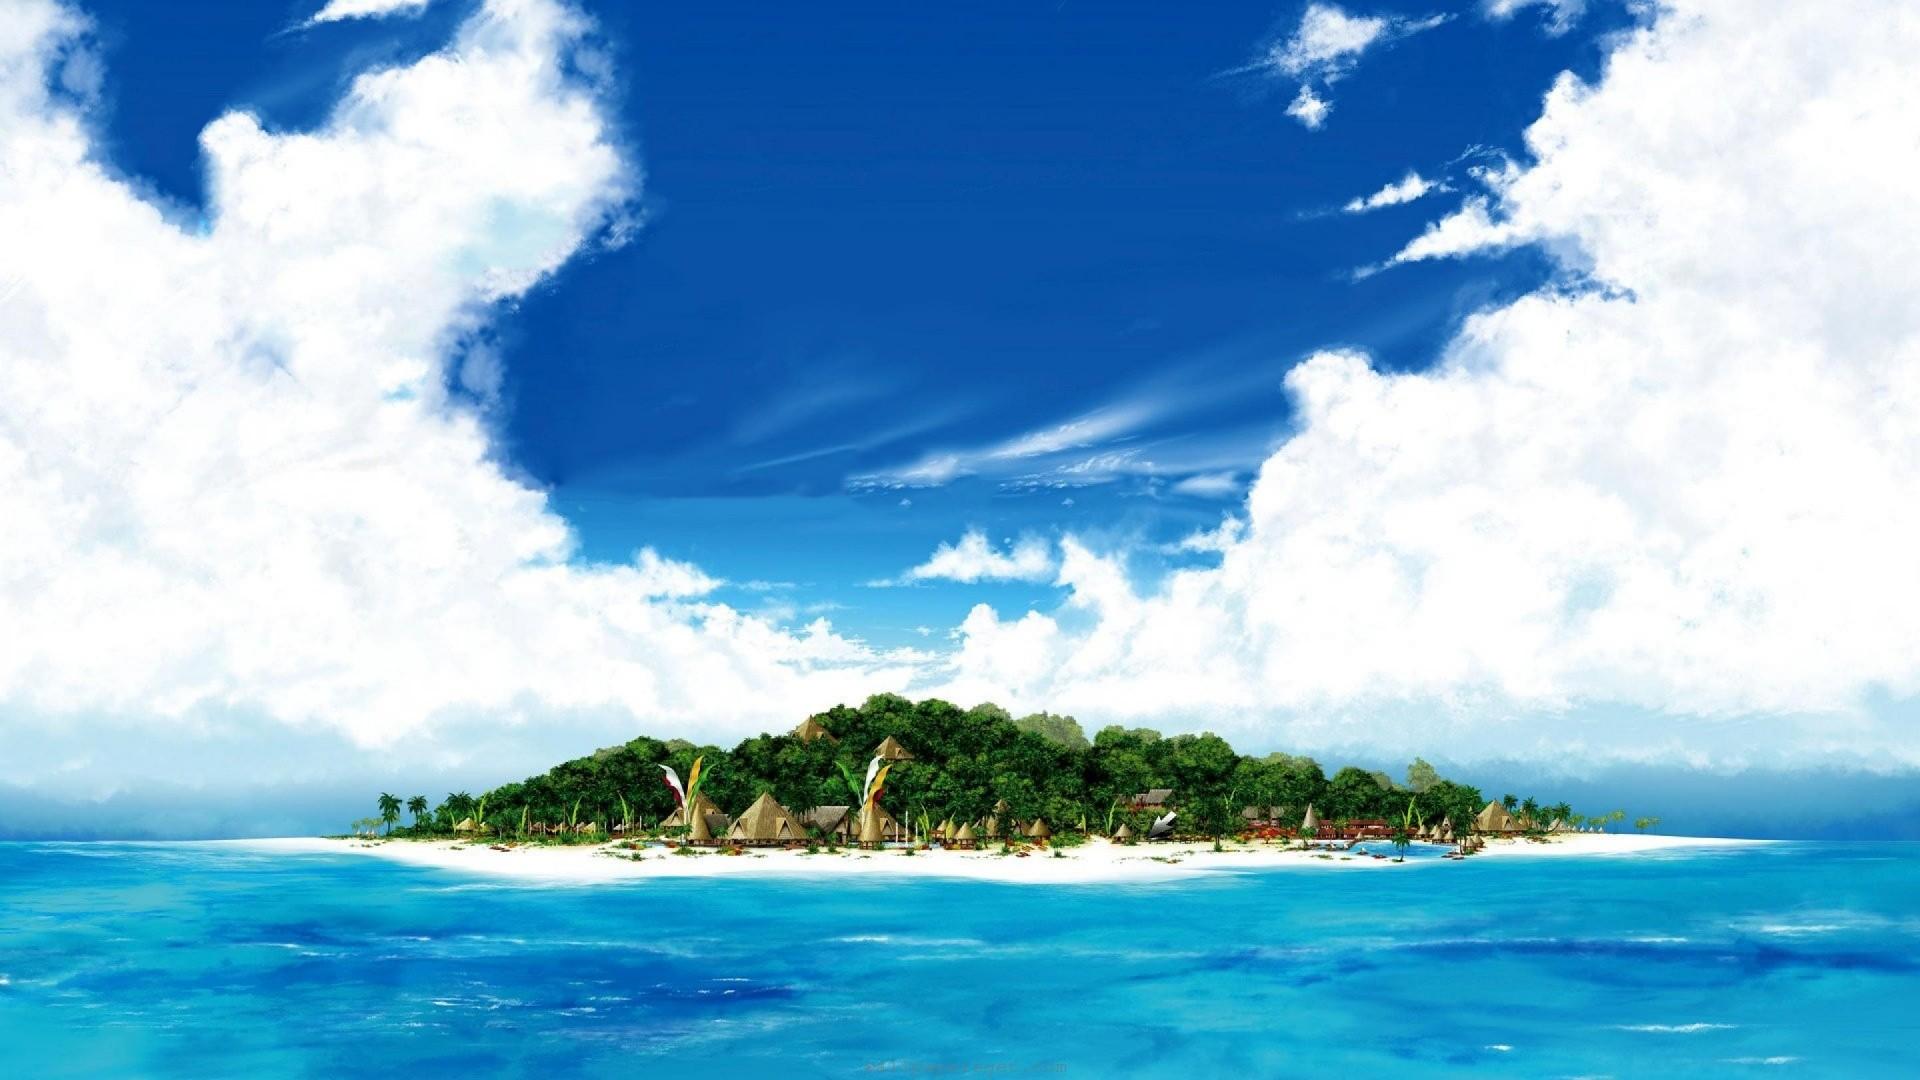 Island hd wallpaper download